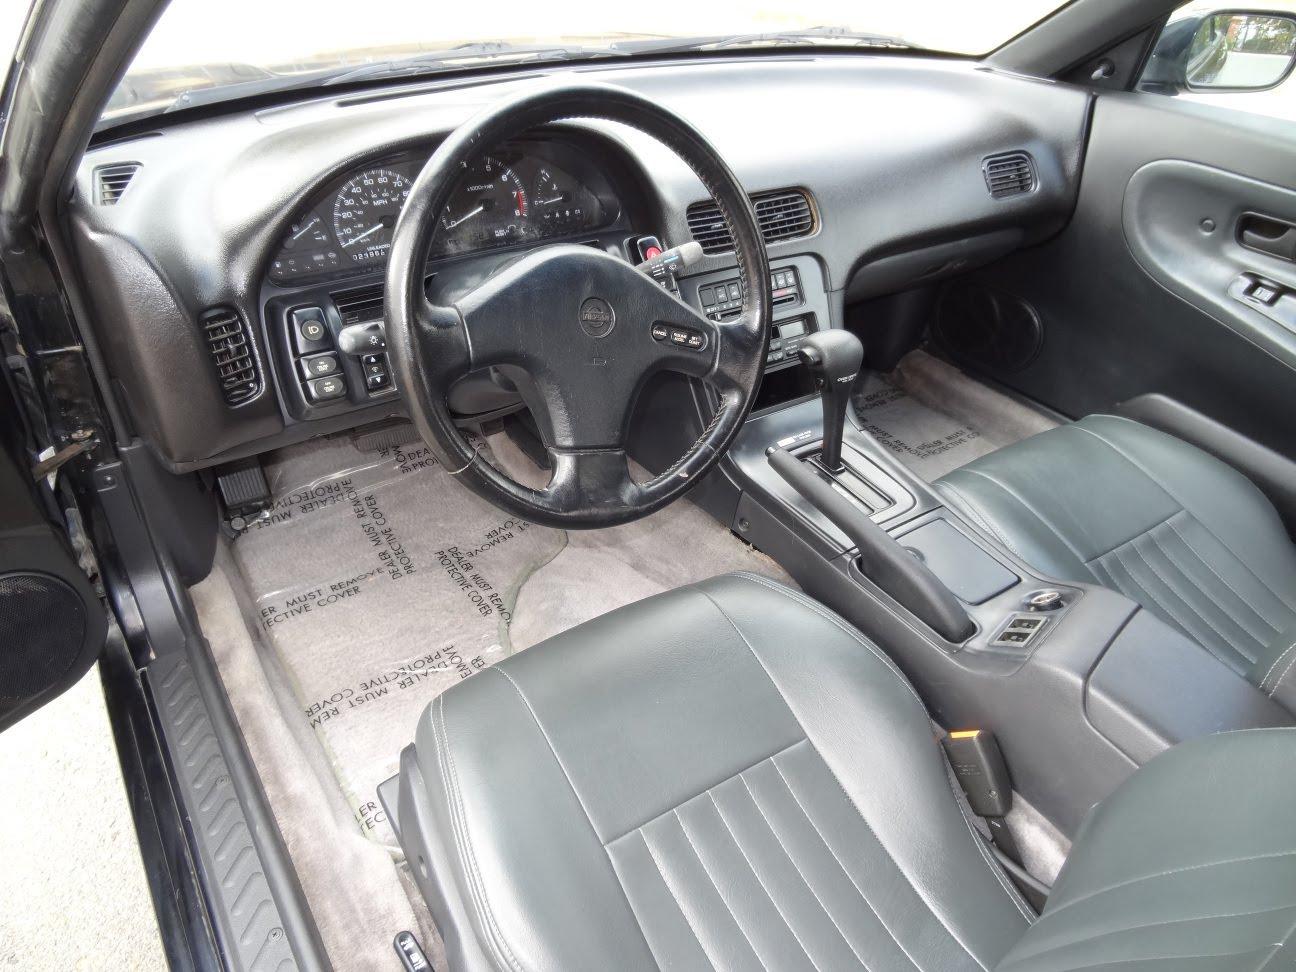 Nissan Silvia VI (S14) 1993 - 1998 Coupe #7